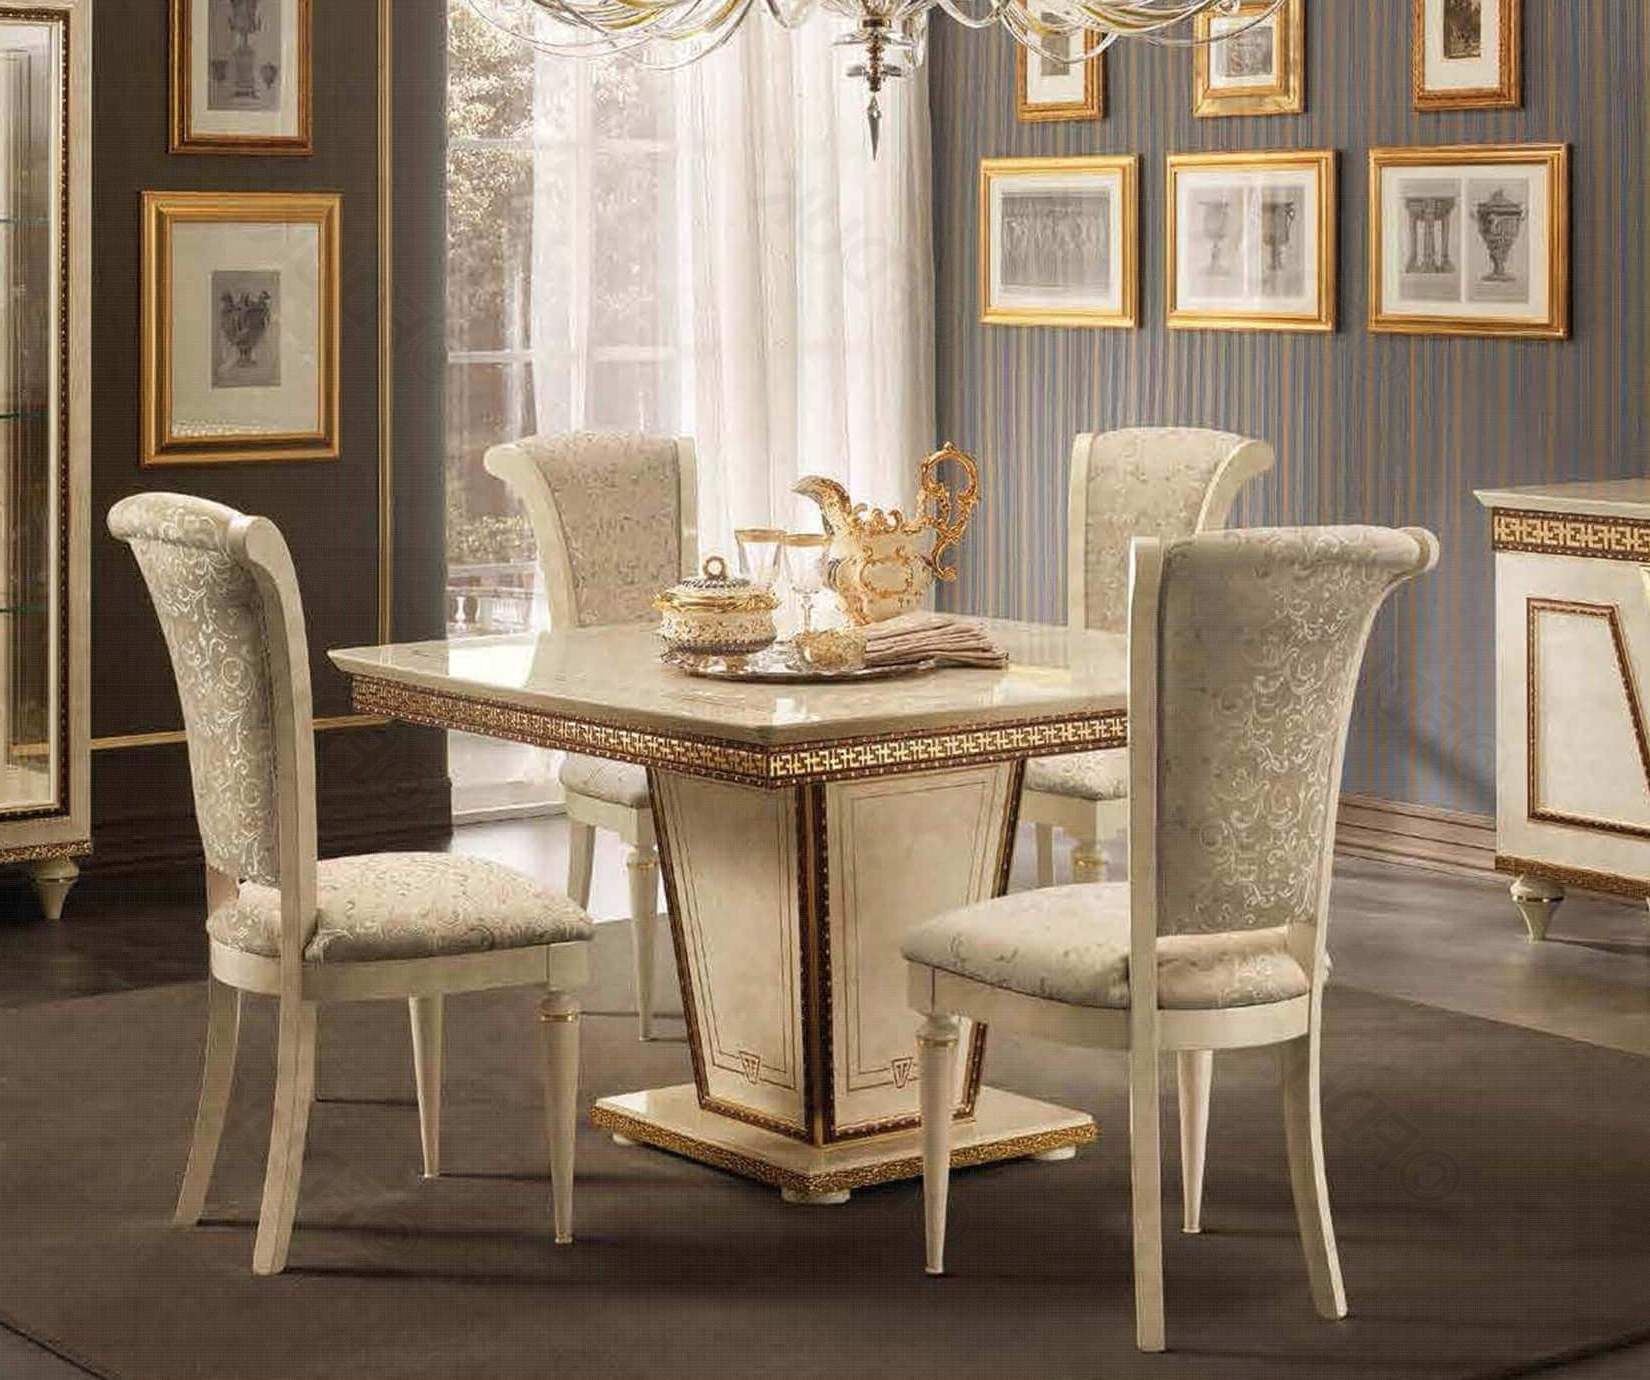 Italian Dining Tables for Famous Arredoclassic Fantasia